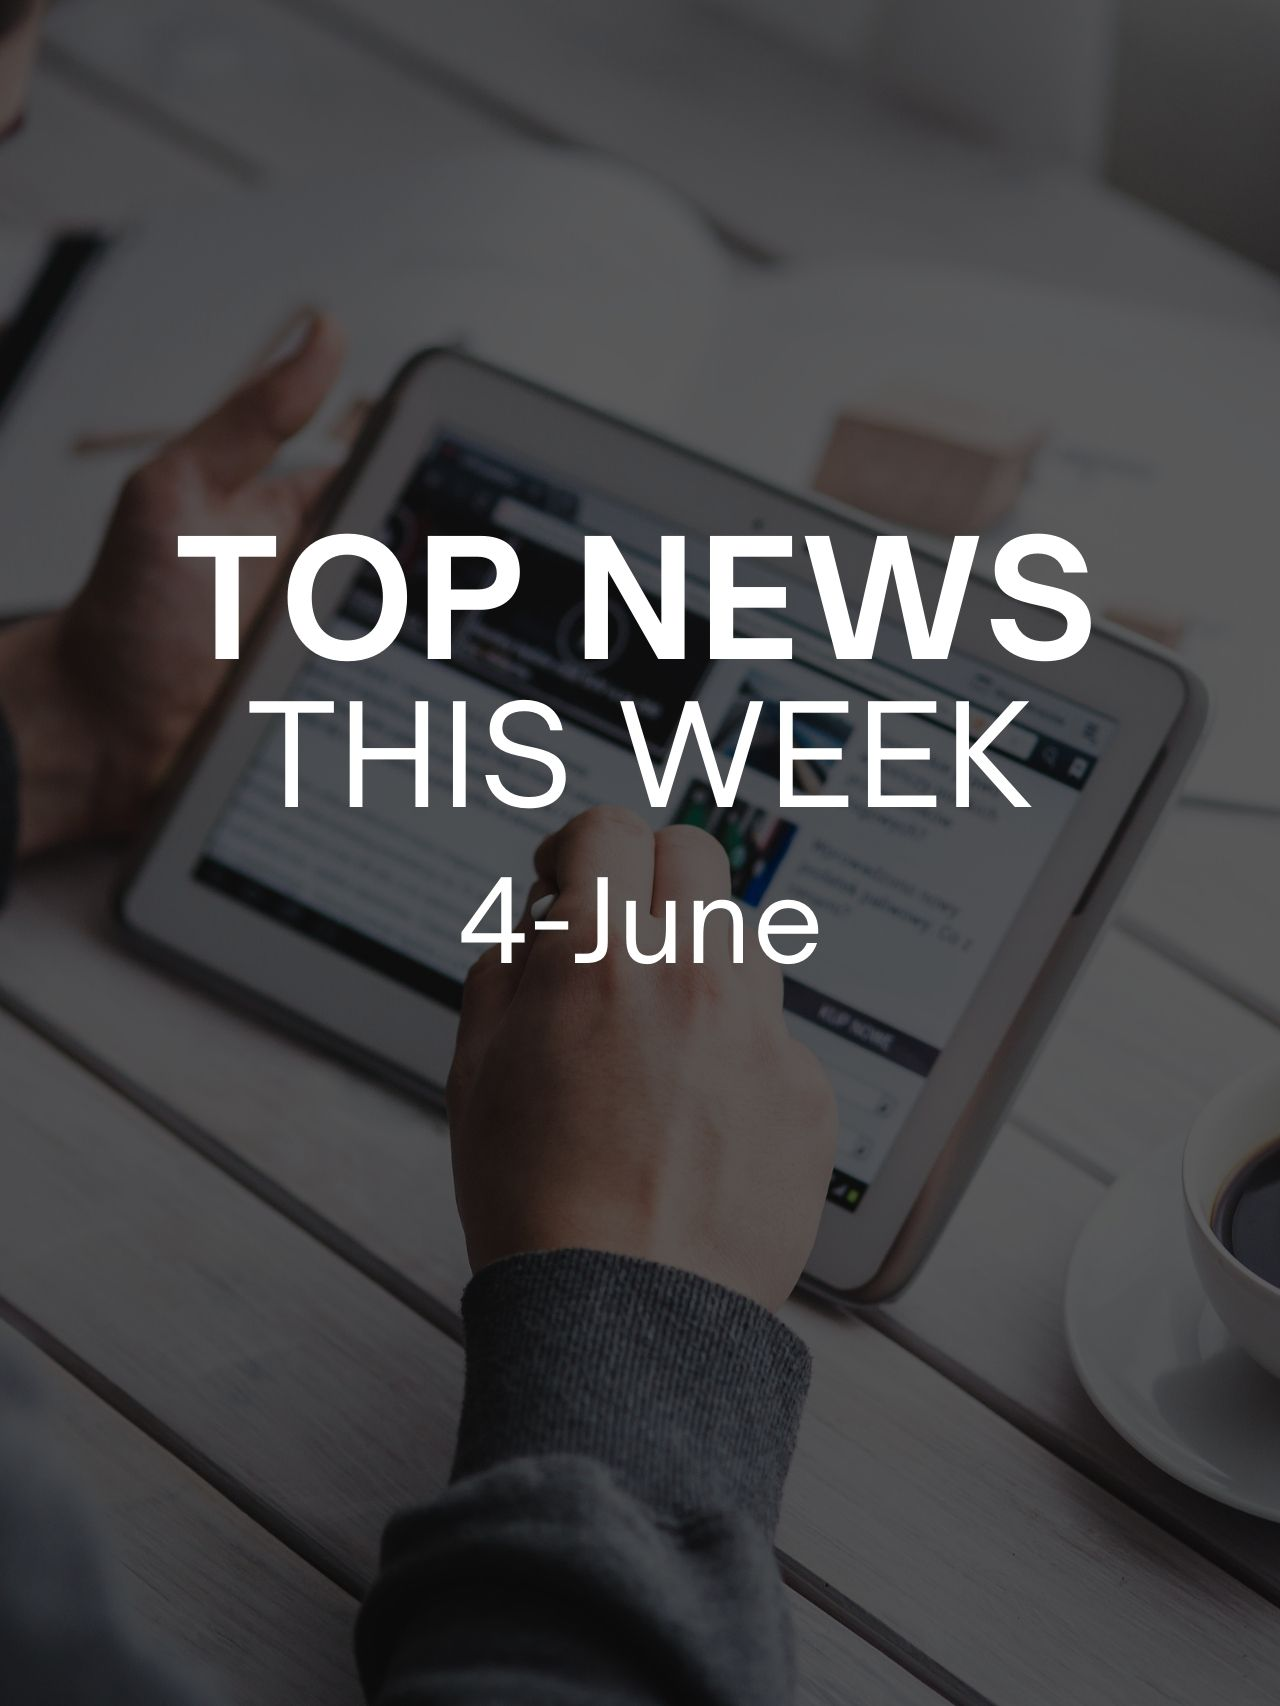 Top News This Week Jun 4